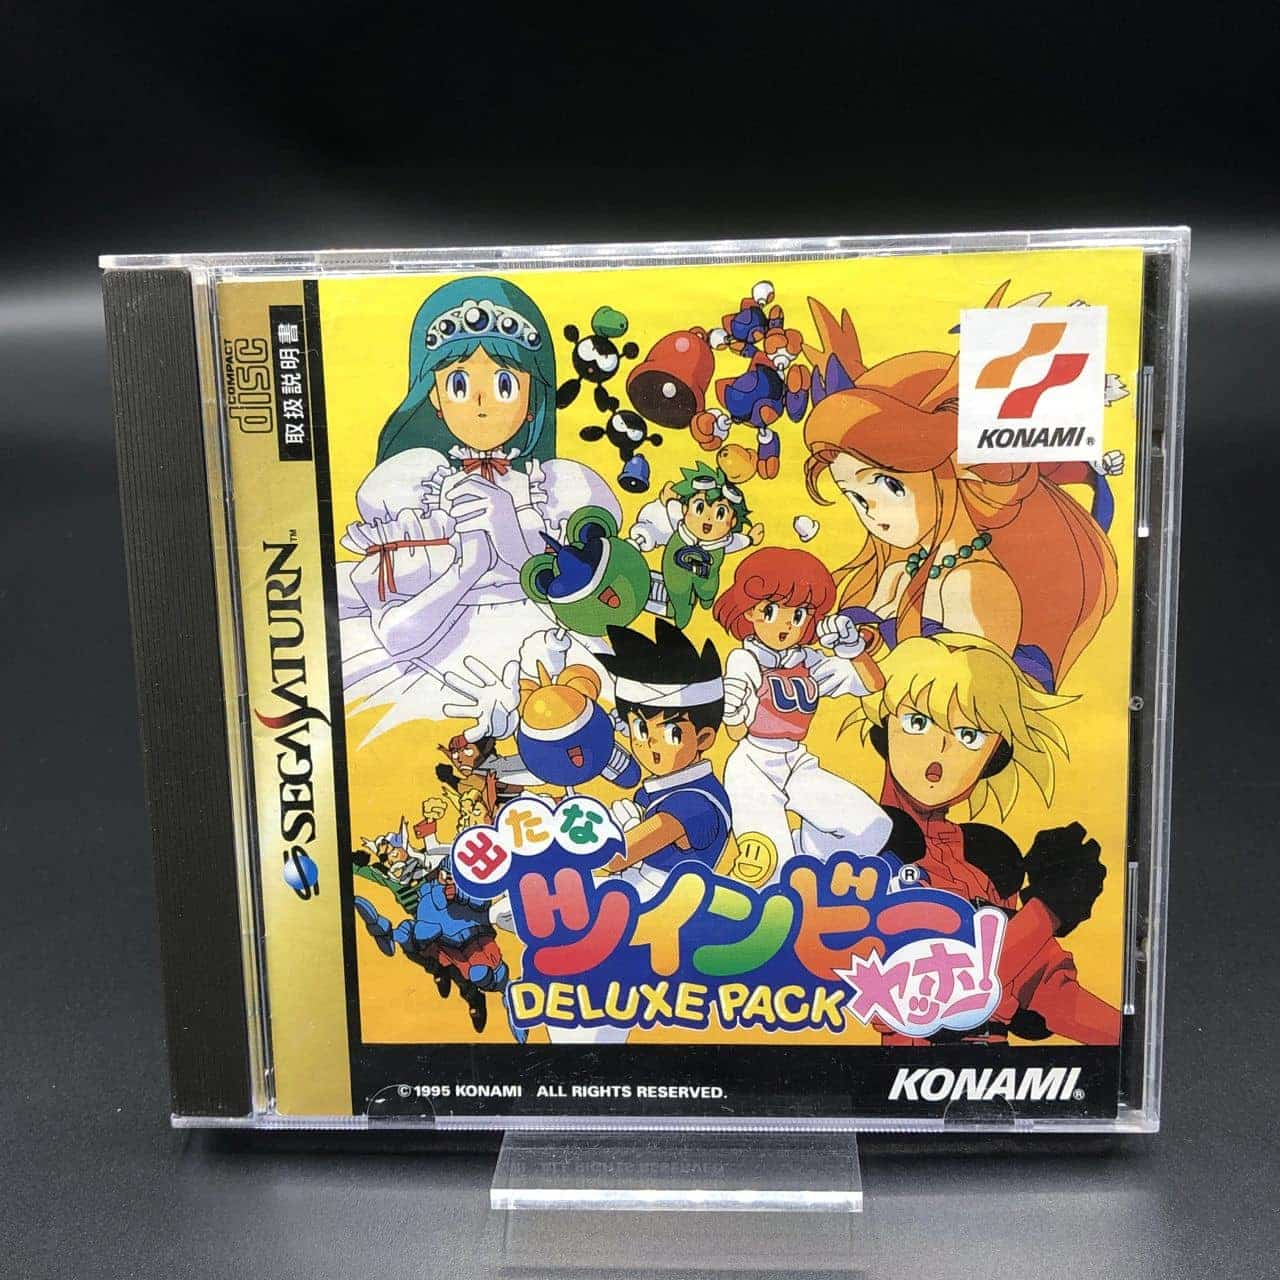 Detana Twinbee Yahoo Deluxe Pack (Import Japan) (Komplett mit Spine) (Sehr gut) Sega Saturn